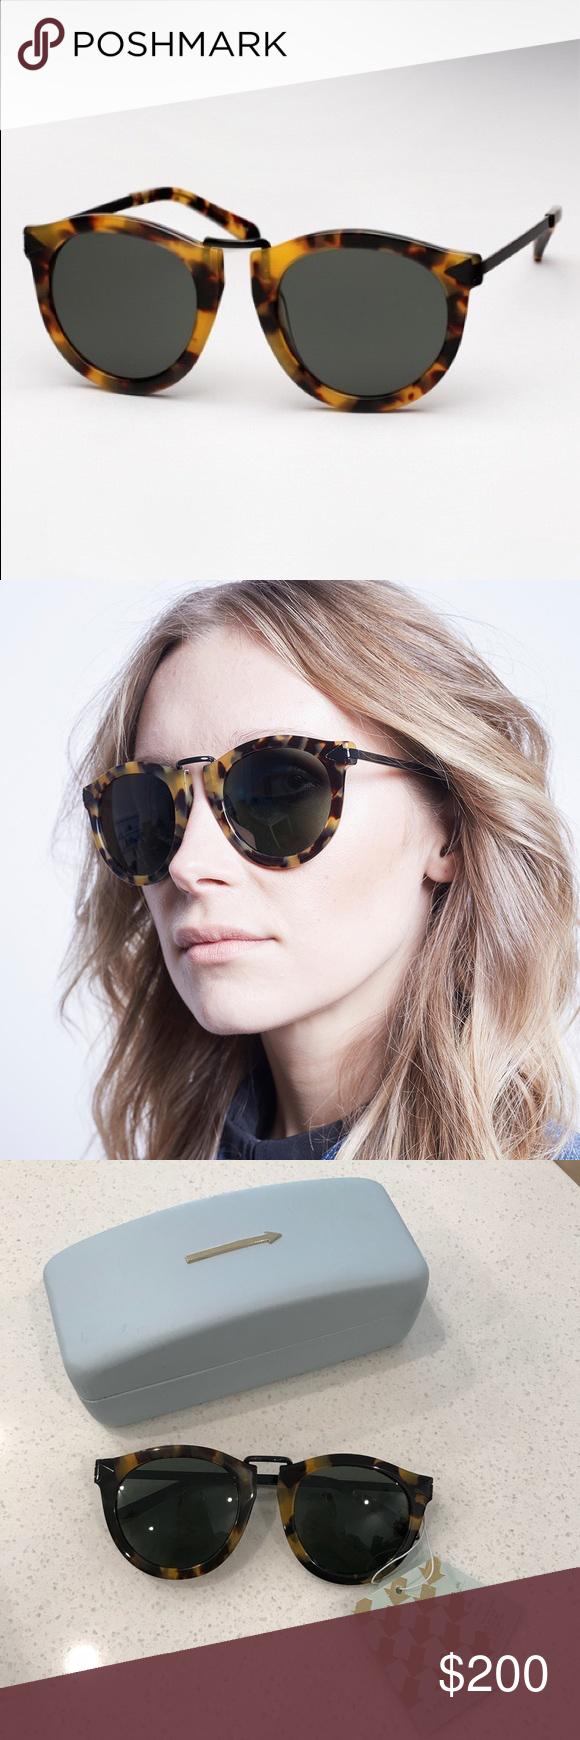 29b3b0b44607 Karen Walker Harvest Crazy Tort Sunglasses